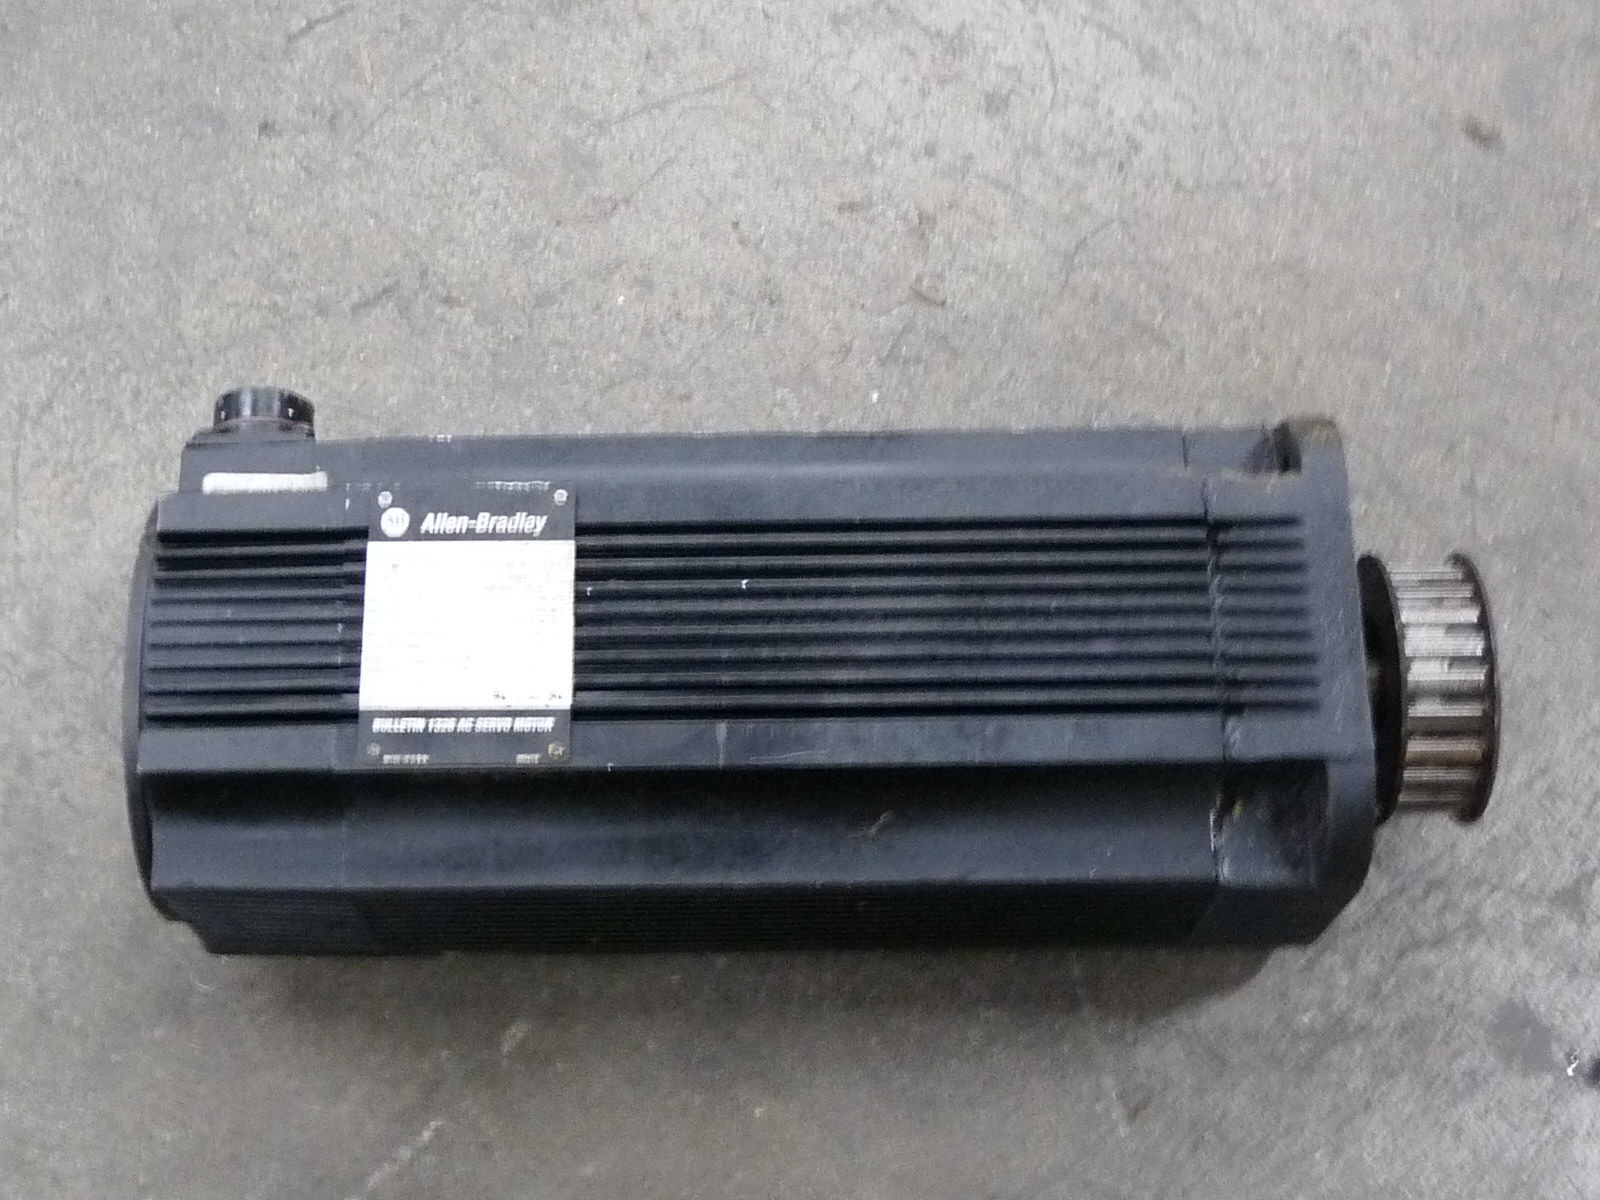 Allen Bradley Reliance 1326ab B530e 21 Servo Motor 460v